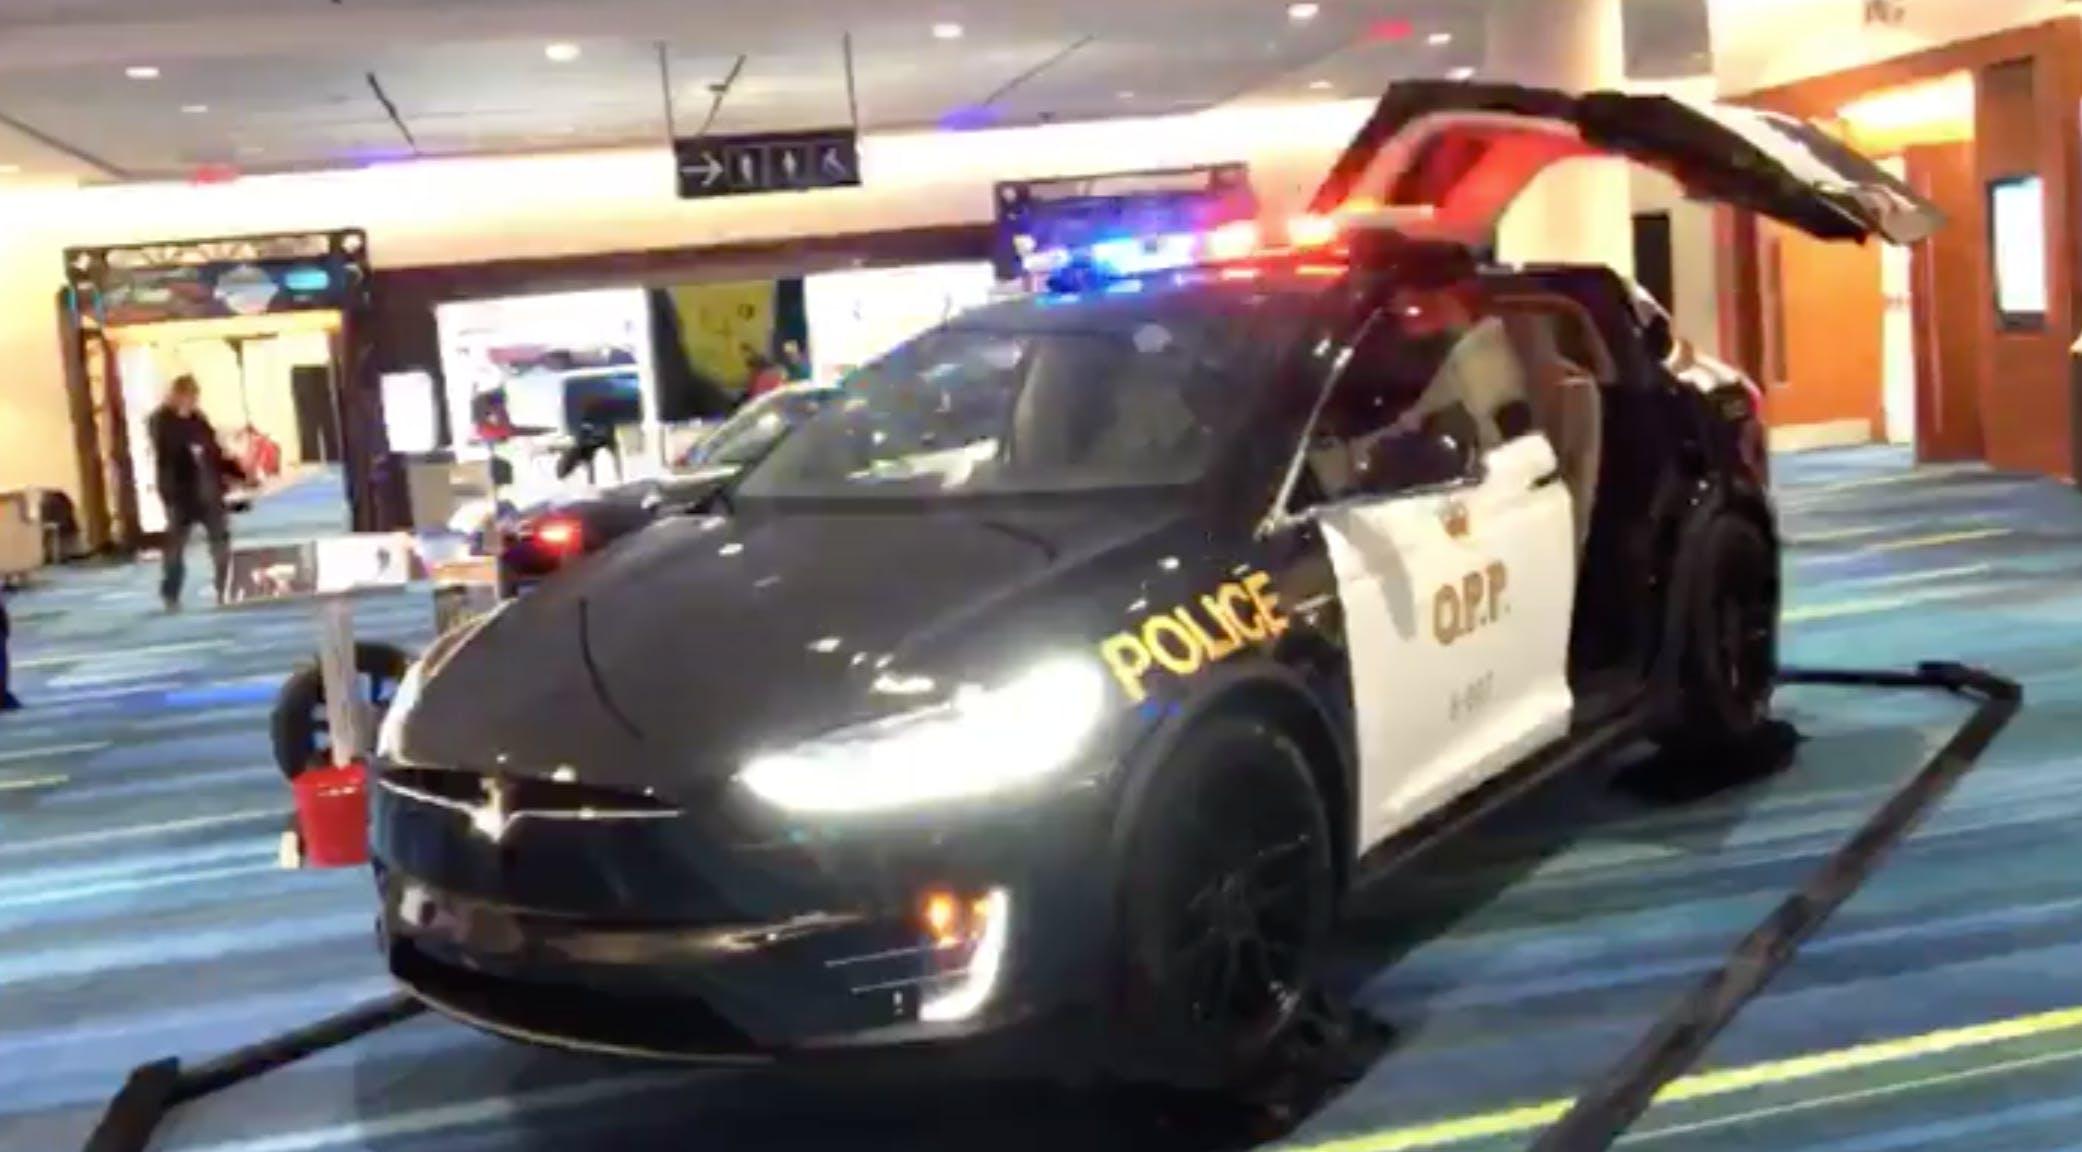 Ontario S Next Police Car Could Be A Tesla Model X Inverse